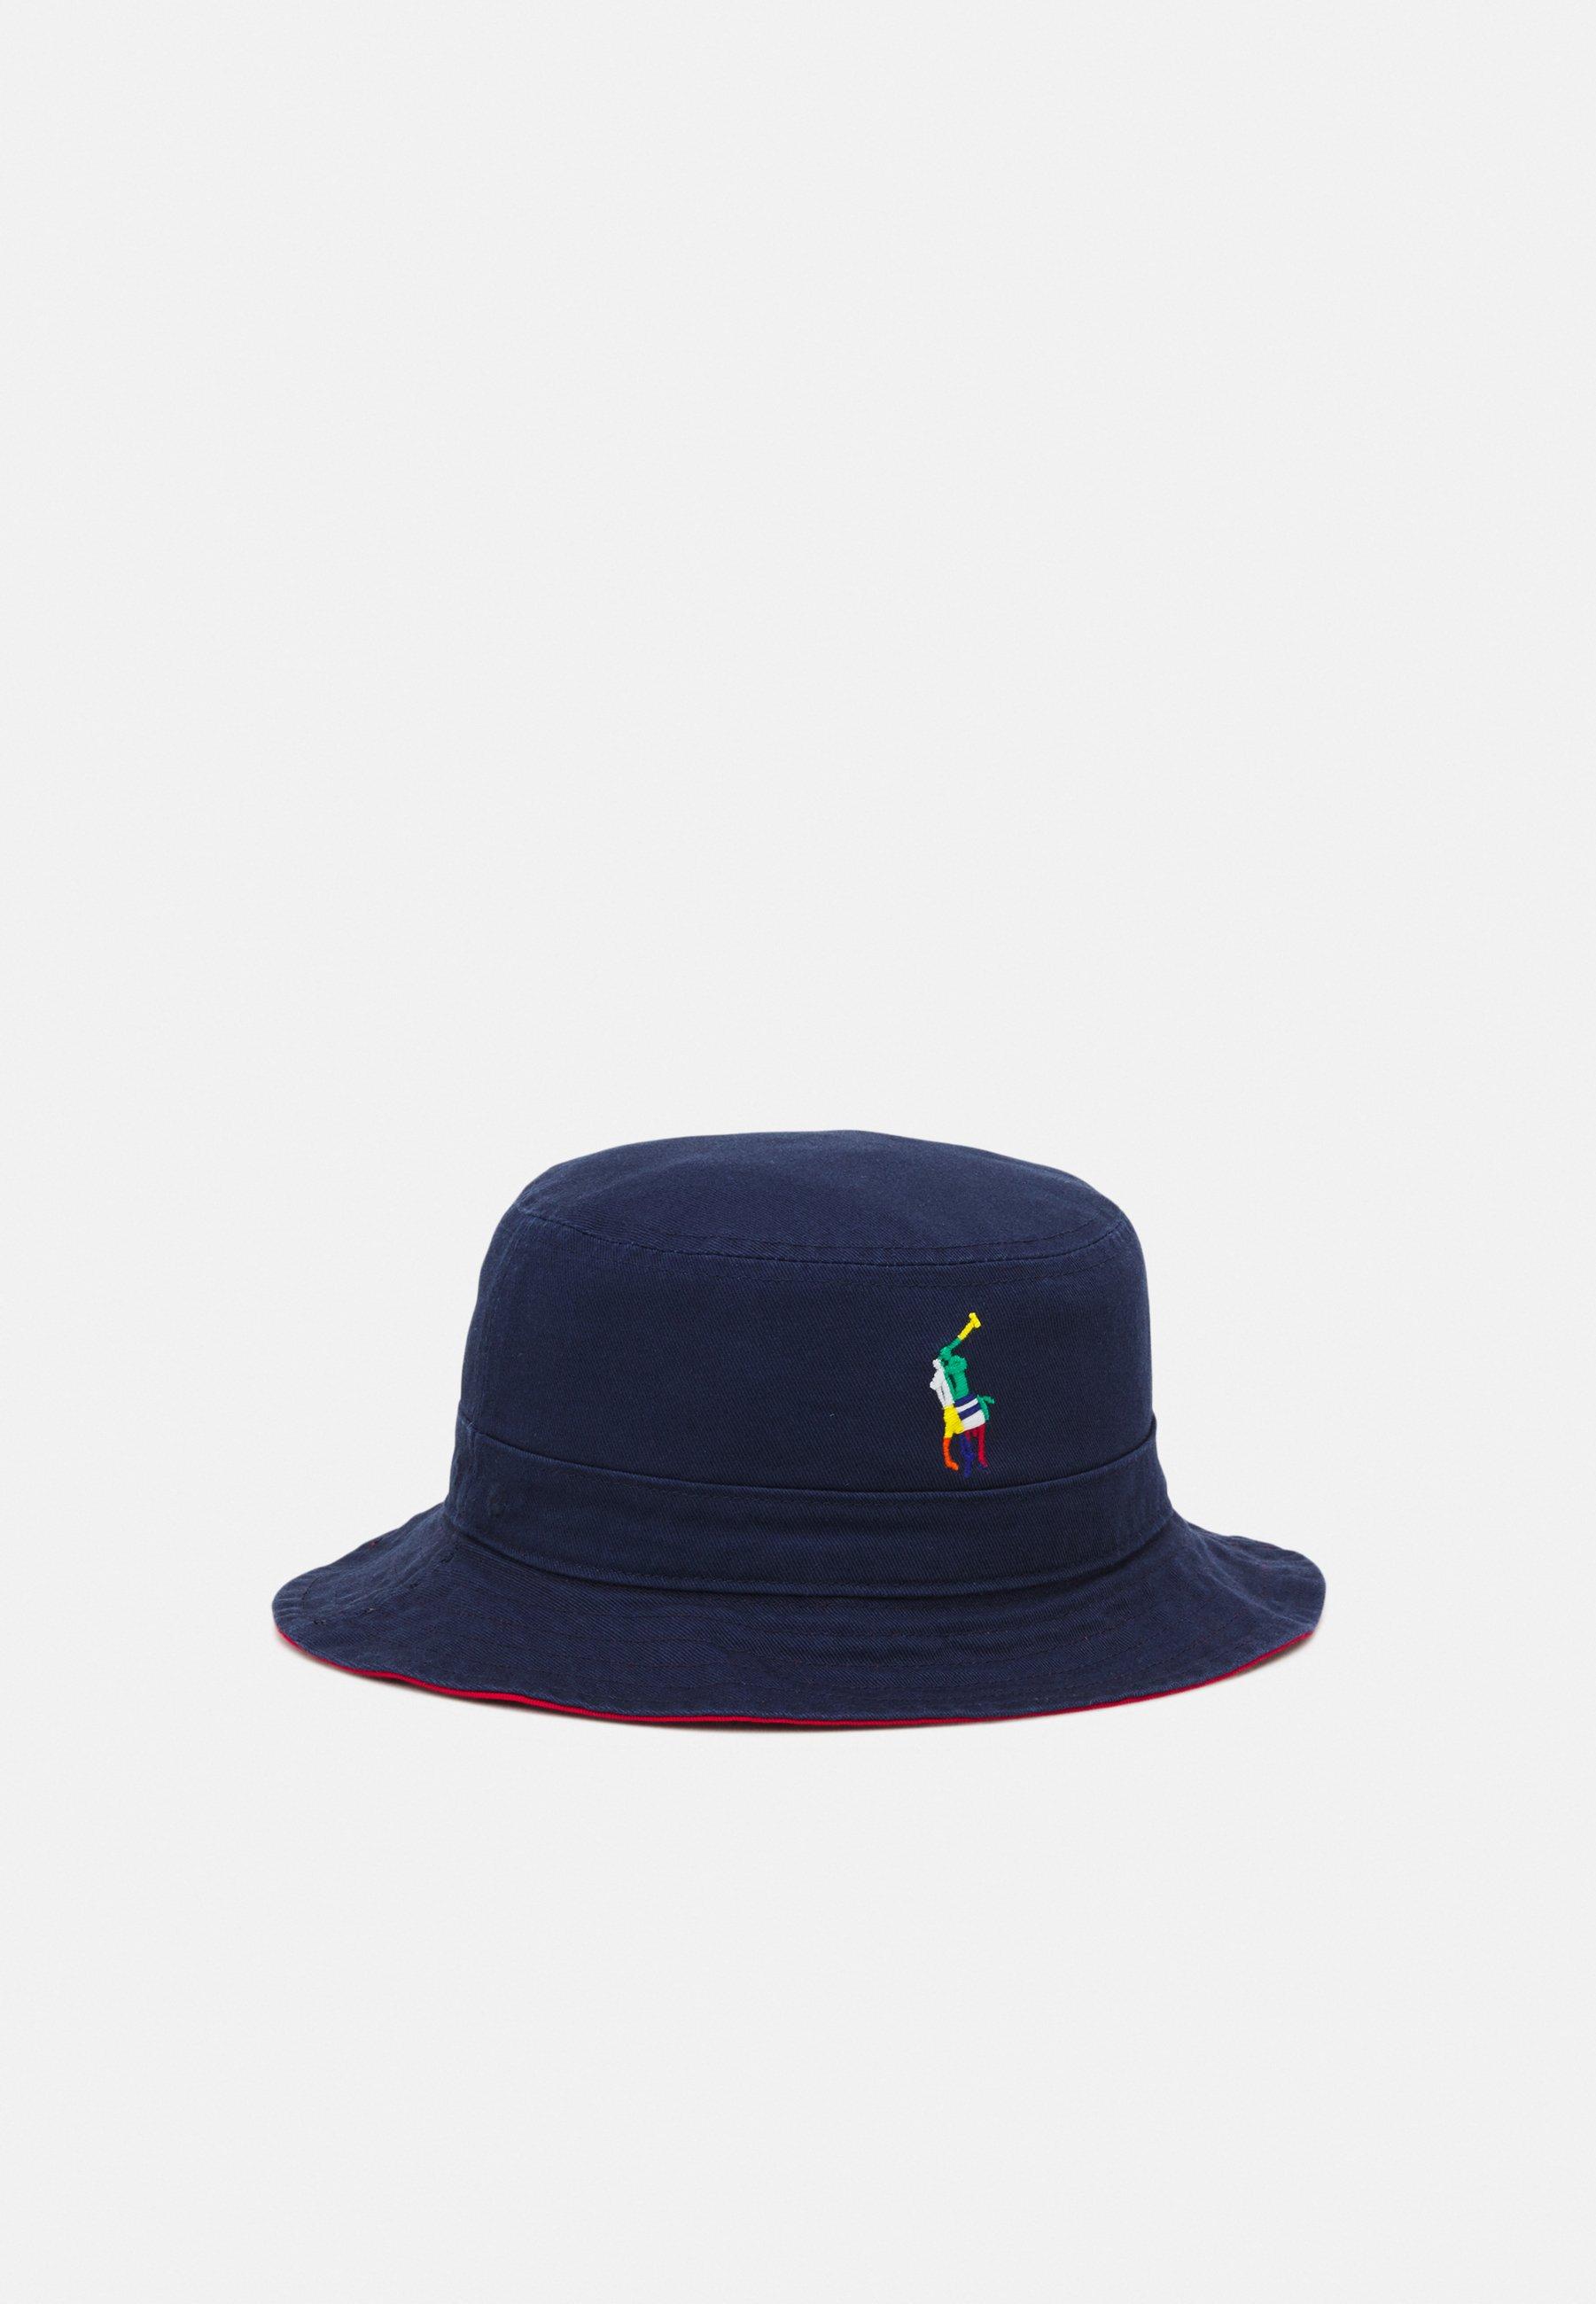 Kinder REV BUCKET HEADWEAR HAT UNISEX - Hut